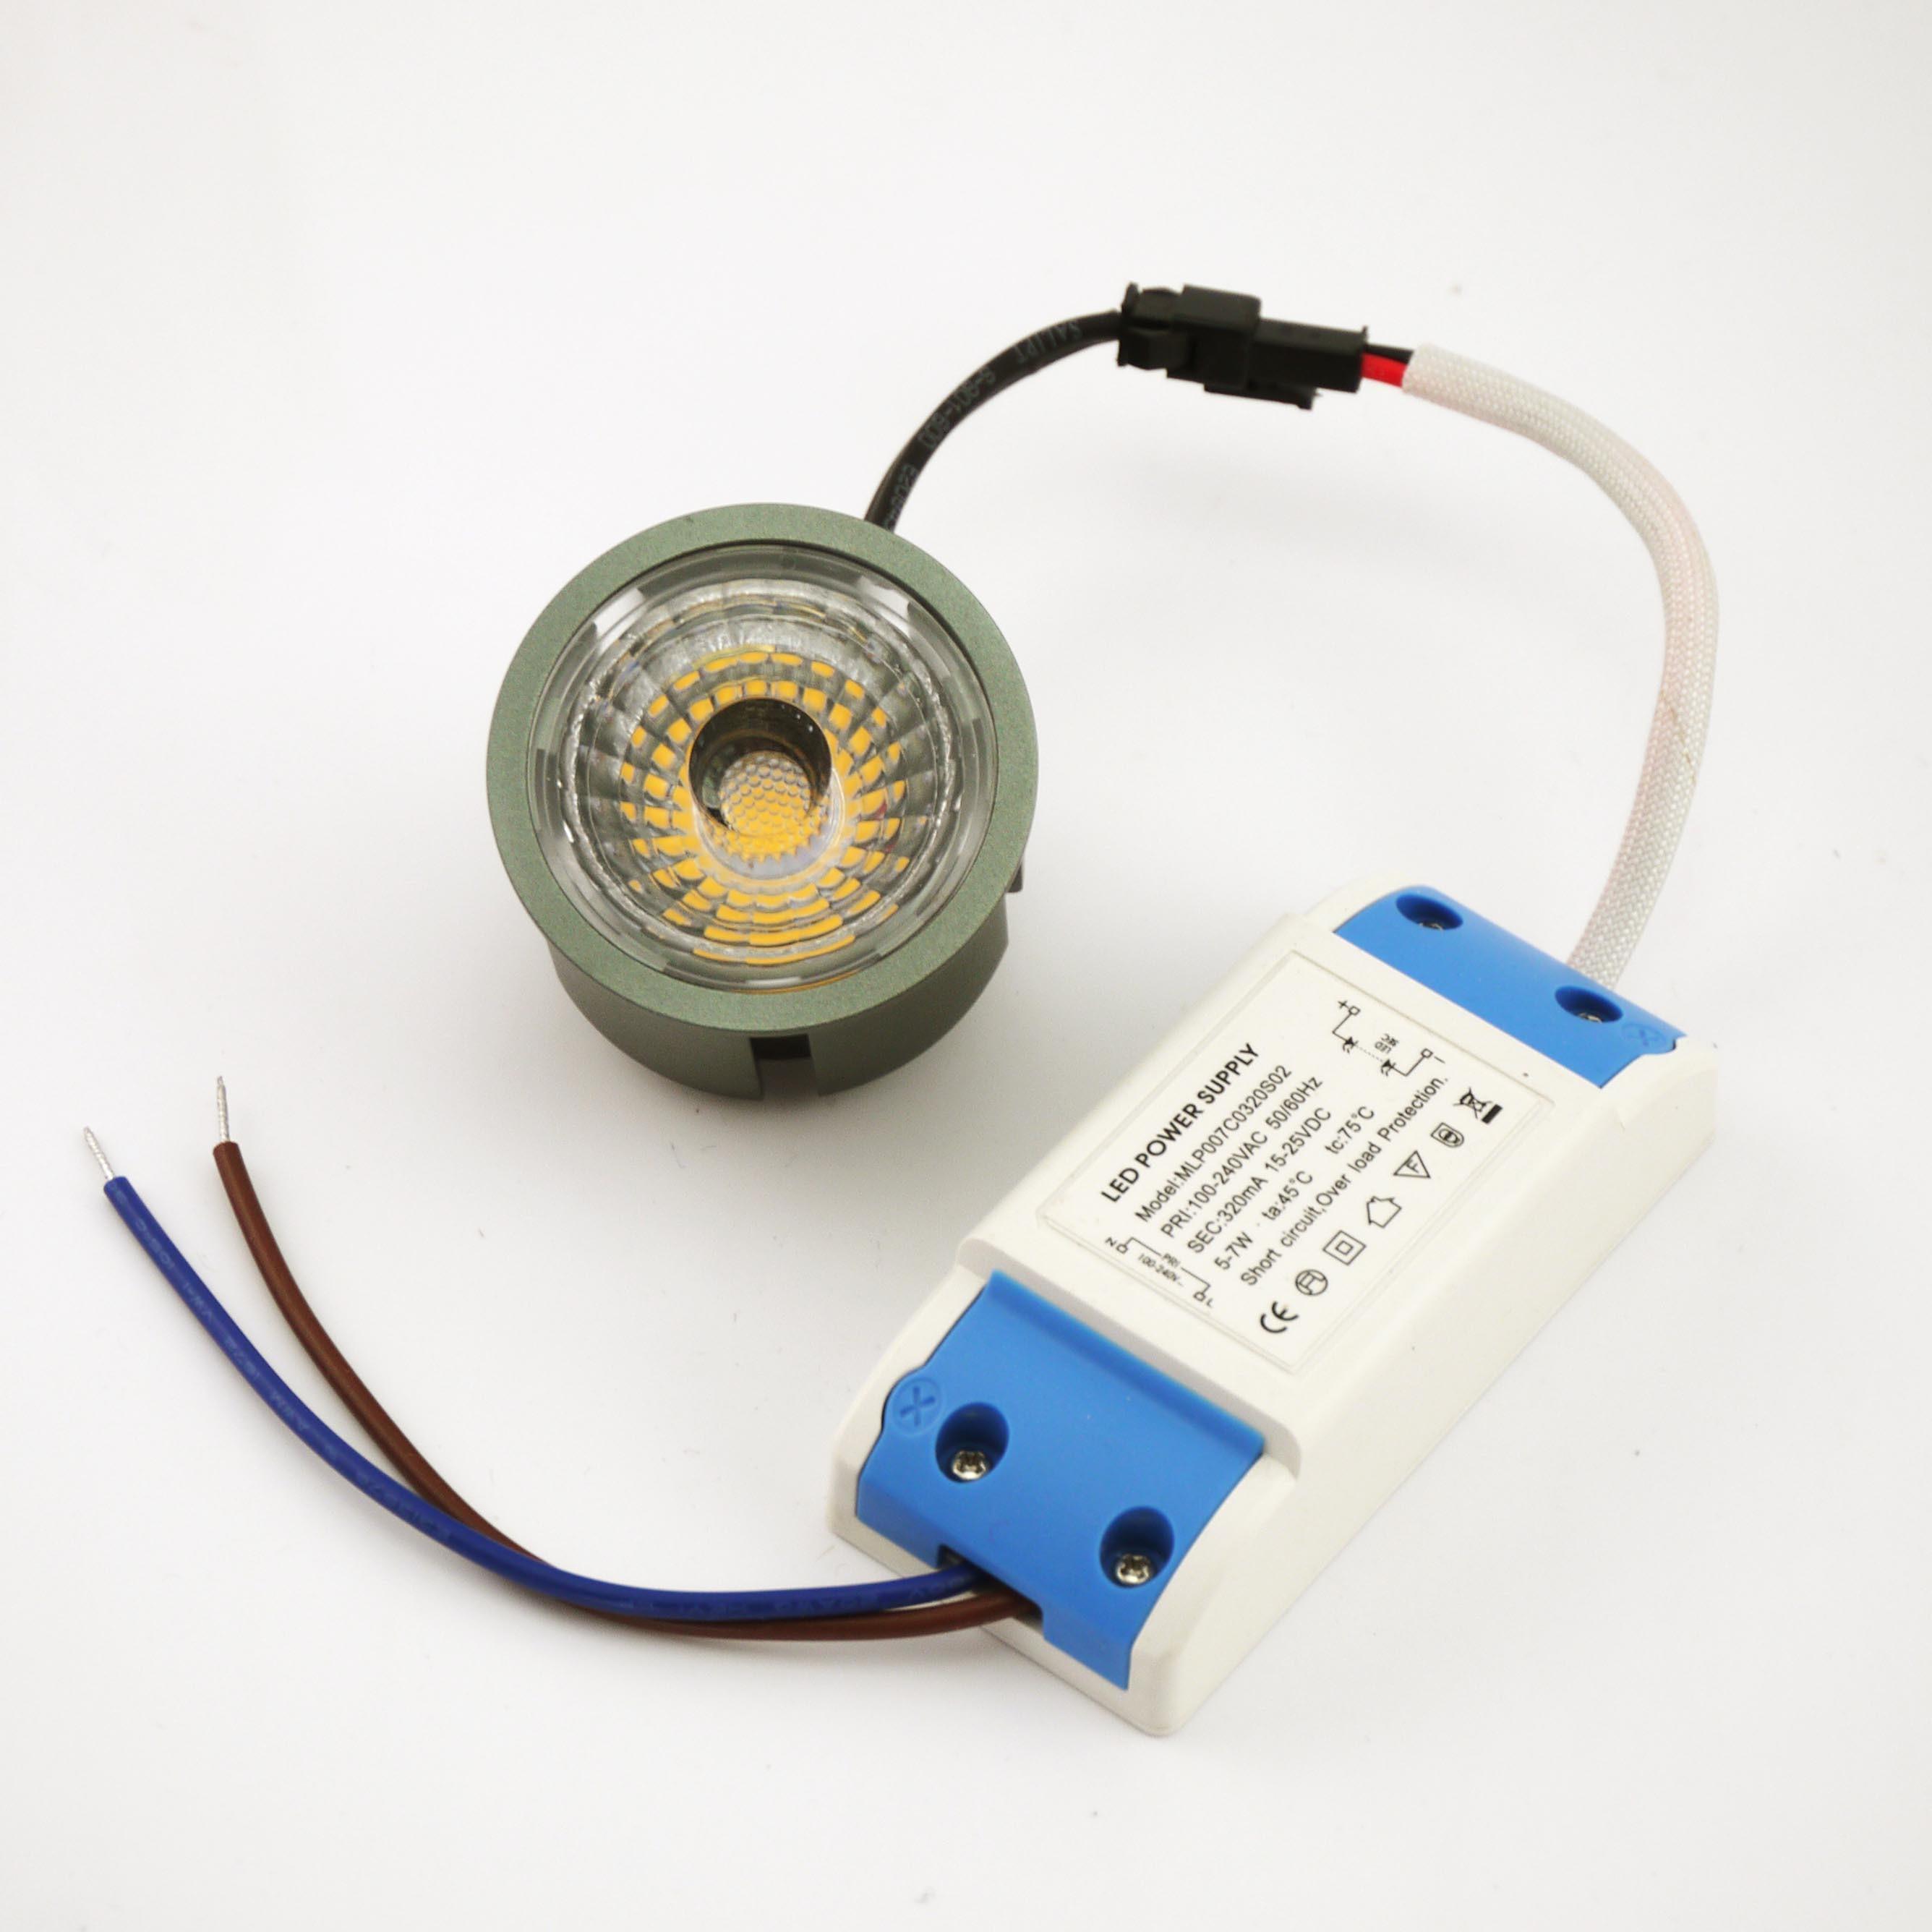 Aluminum 7W COB LED Recessed Downlight Bulb (external power supply) Lt8003-7W